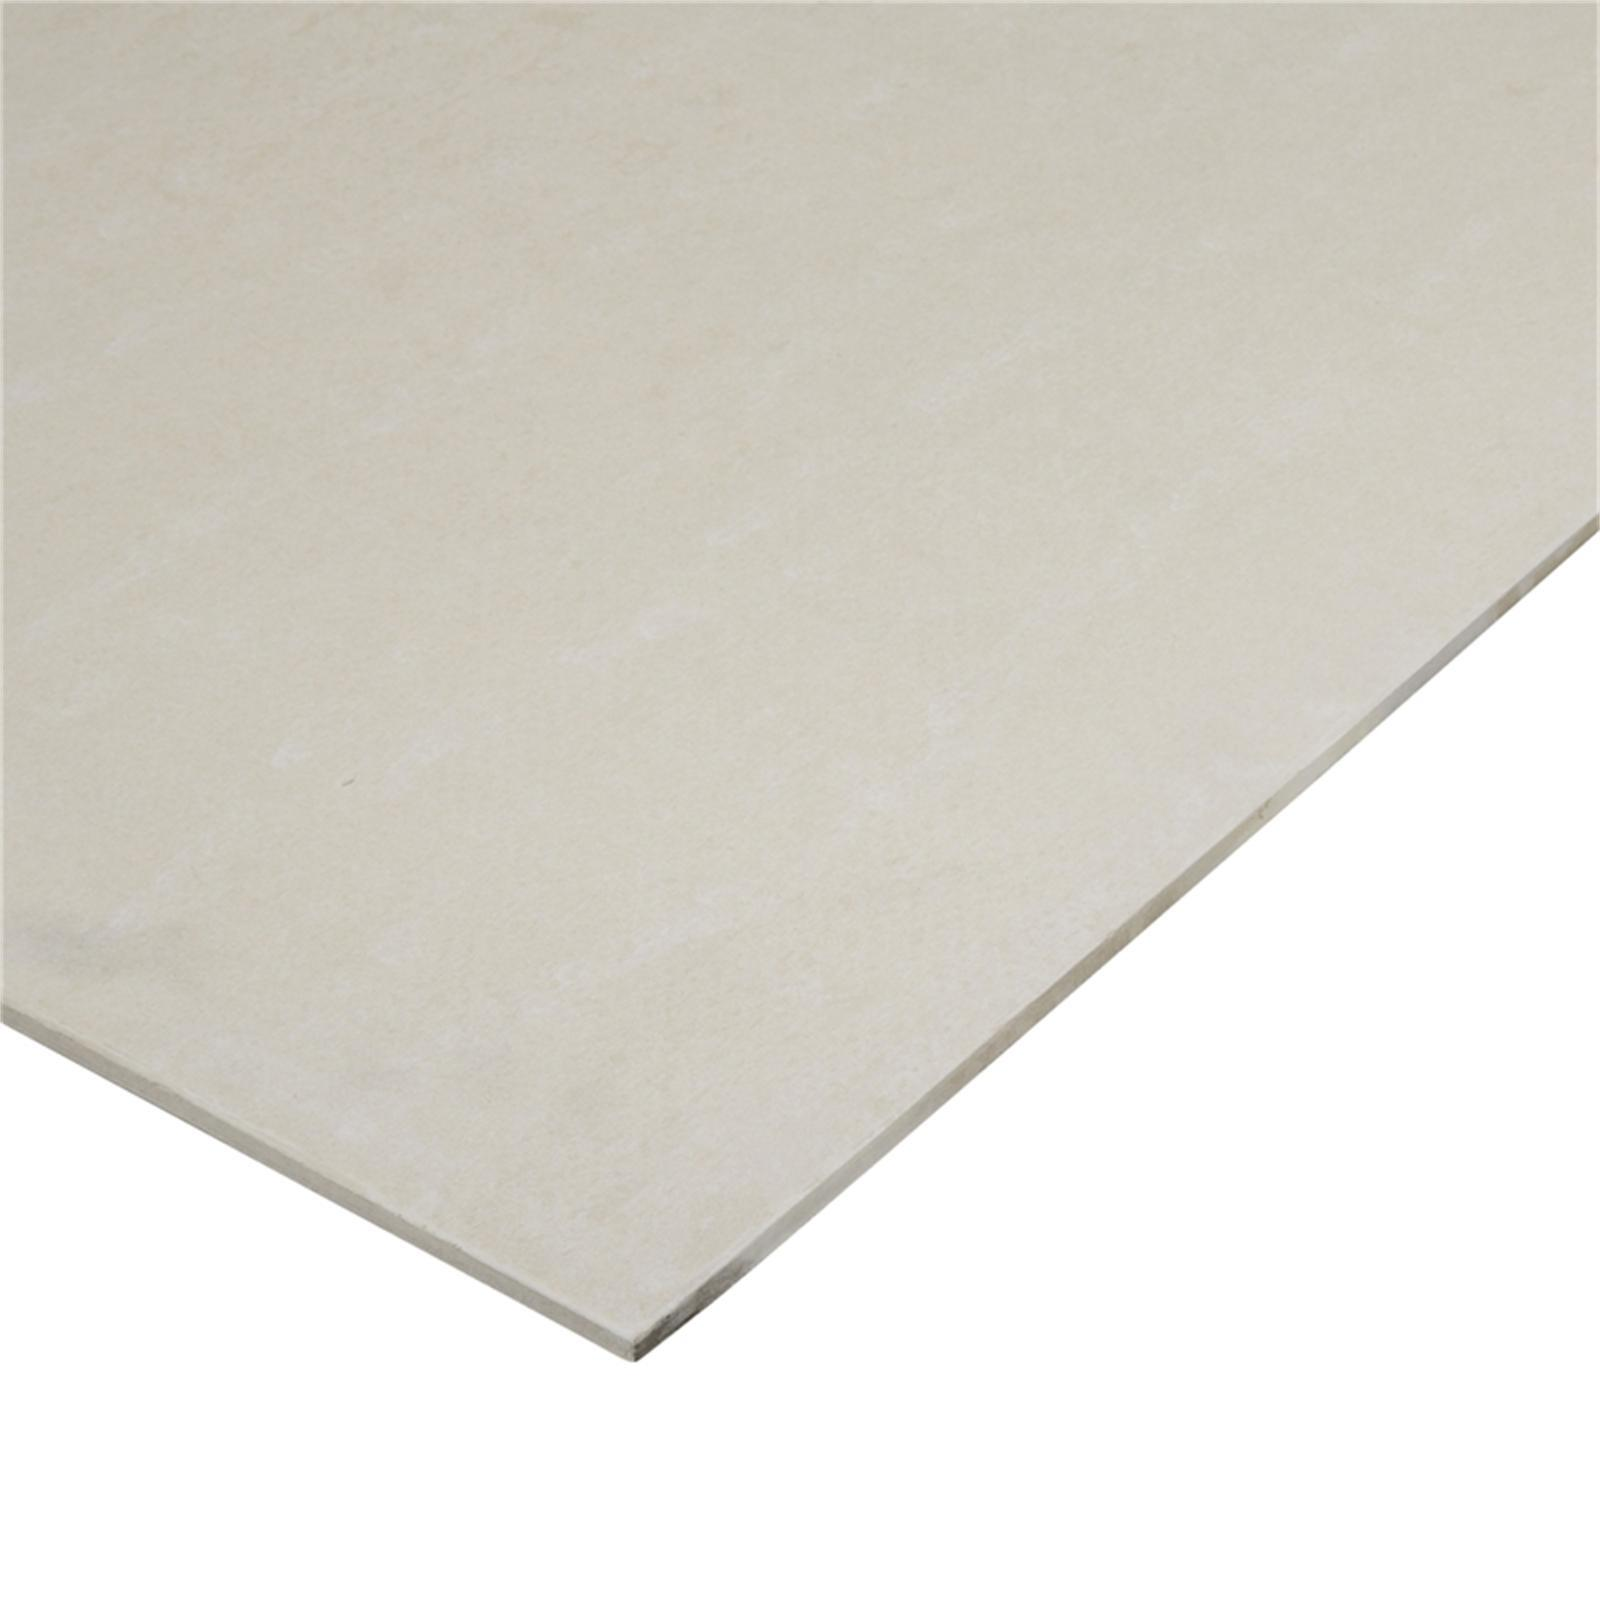 Primaflex 2400 x 1200 x 4.5mm Cement Panel